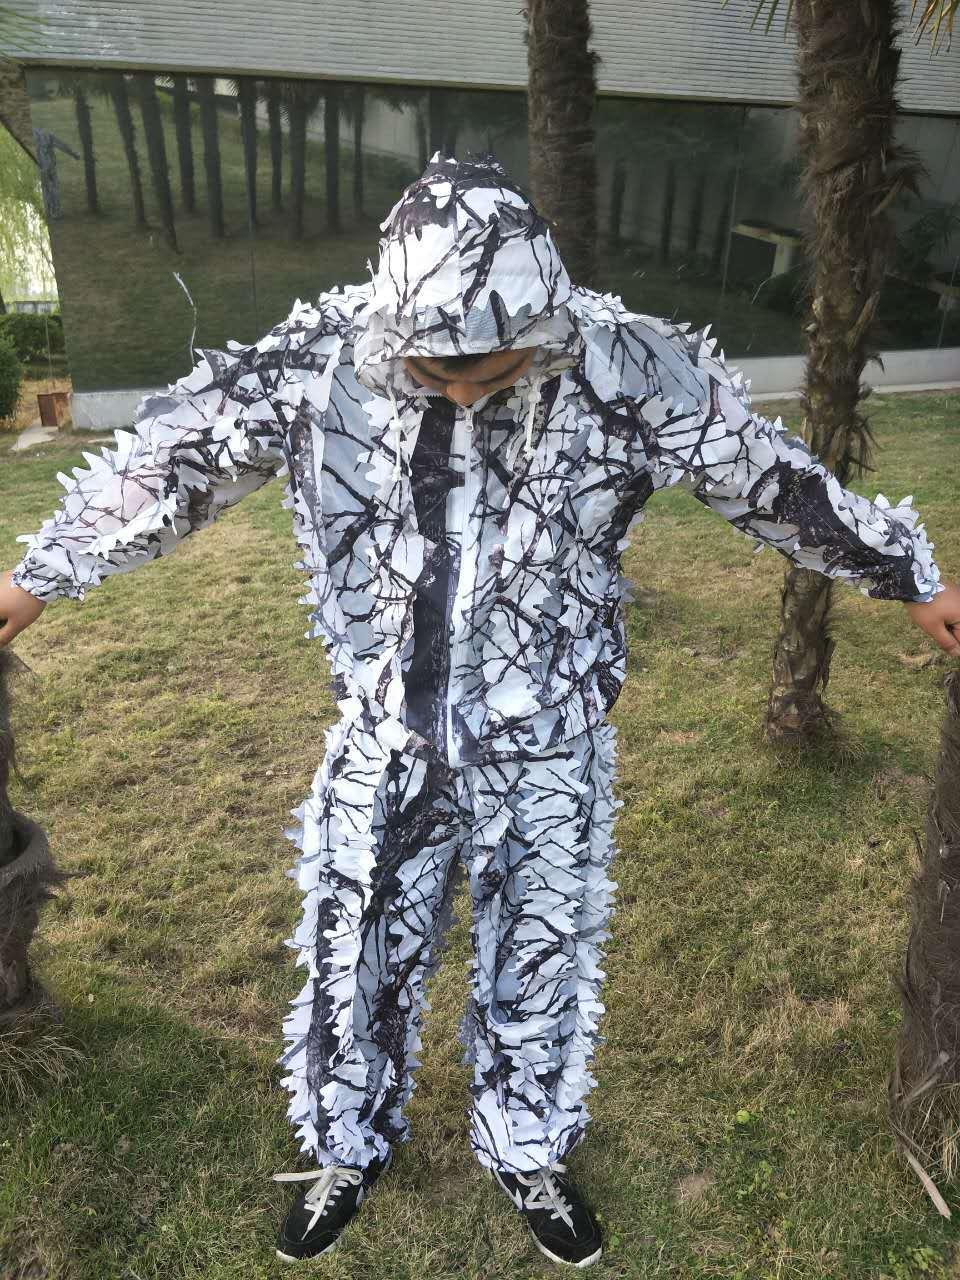 huge discount order get cheap € 20.92 50% de réduction 3D blanc neige prunier branches style camouflage  ghillie costume bird watch airsoft chasse vêtements comprennent veste et ...